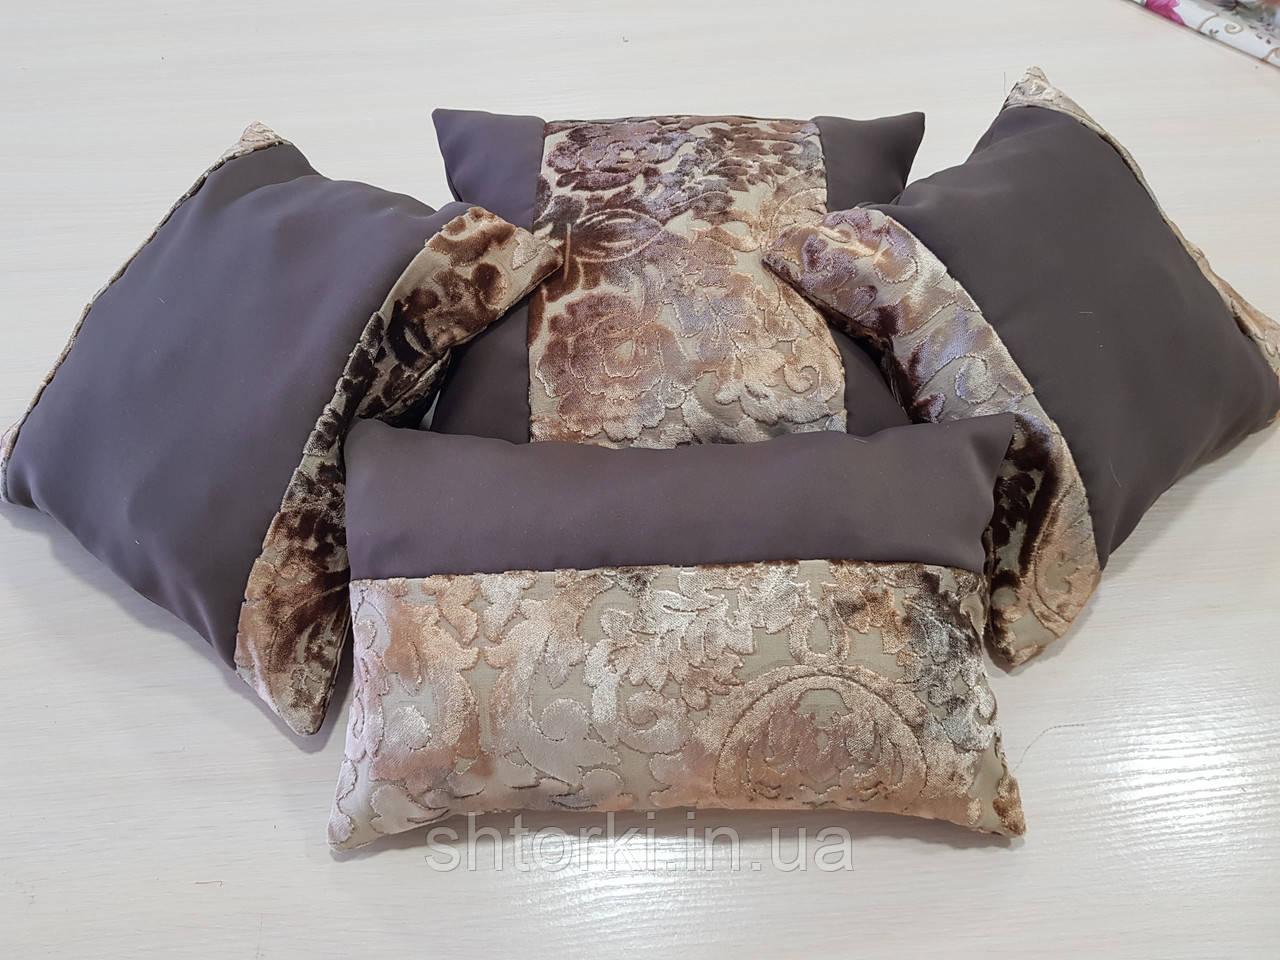 Комплект подушек шоколад Корона плюш 4шт